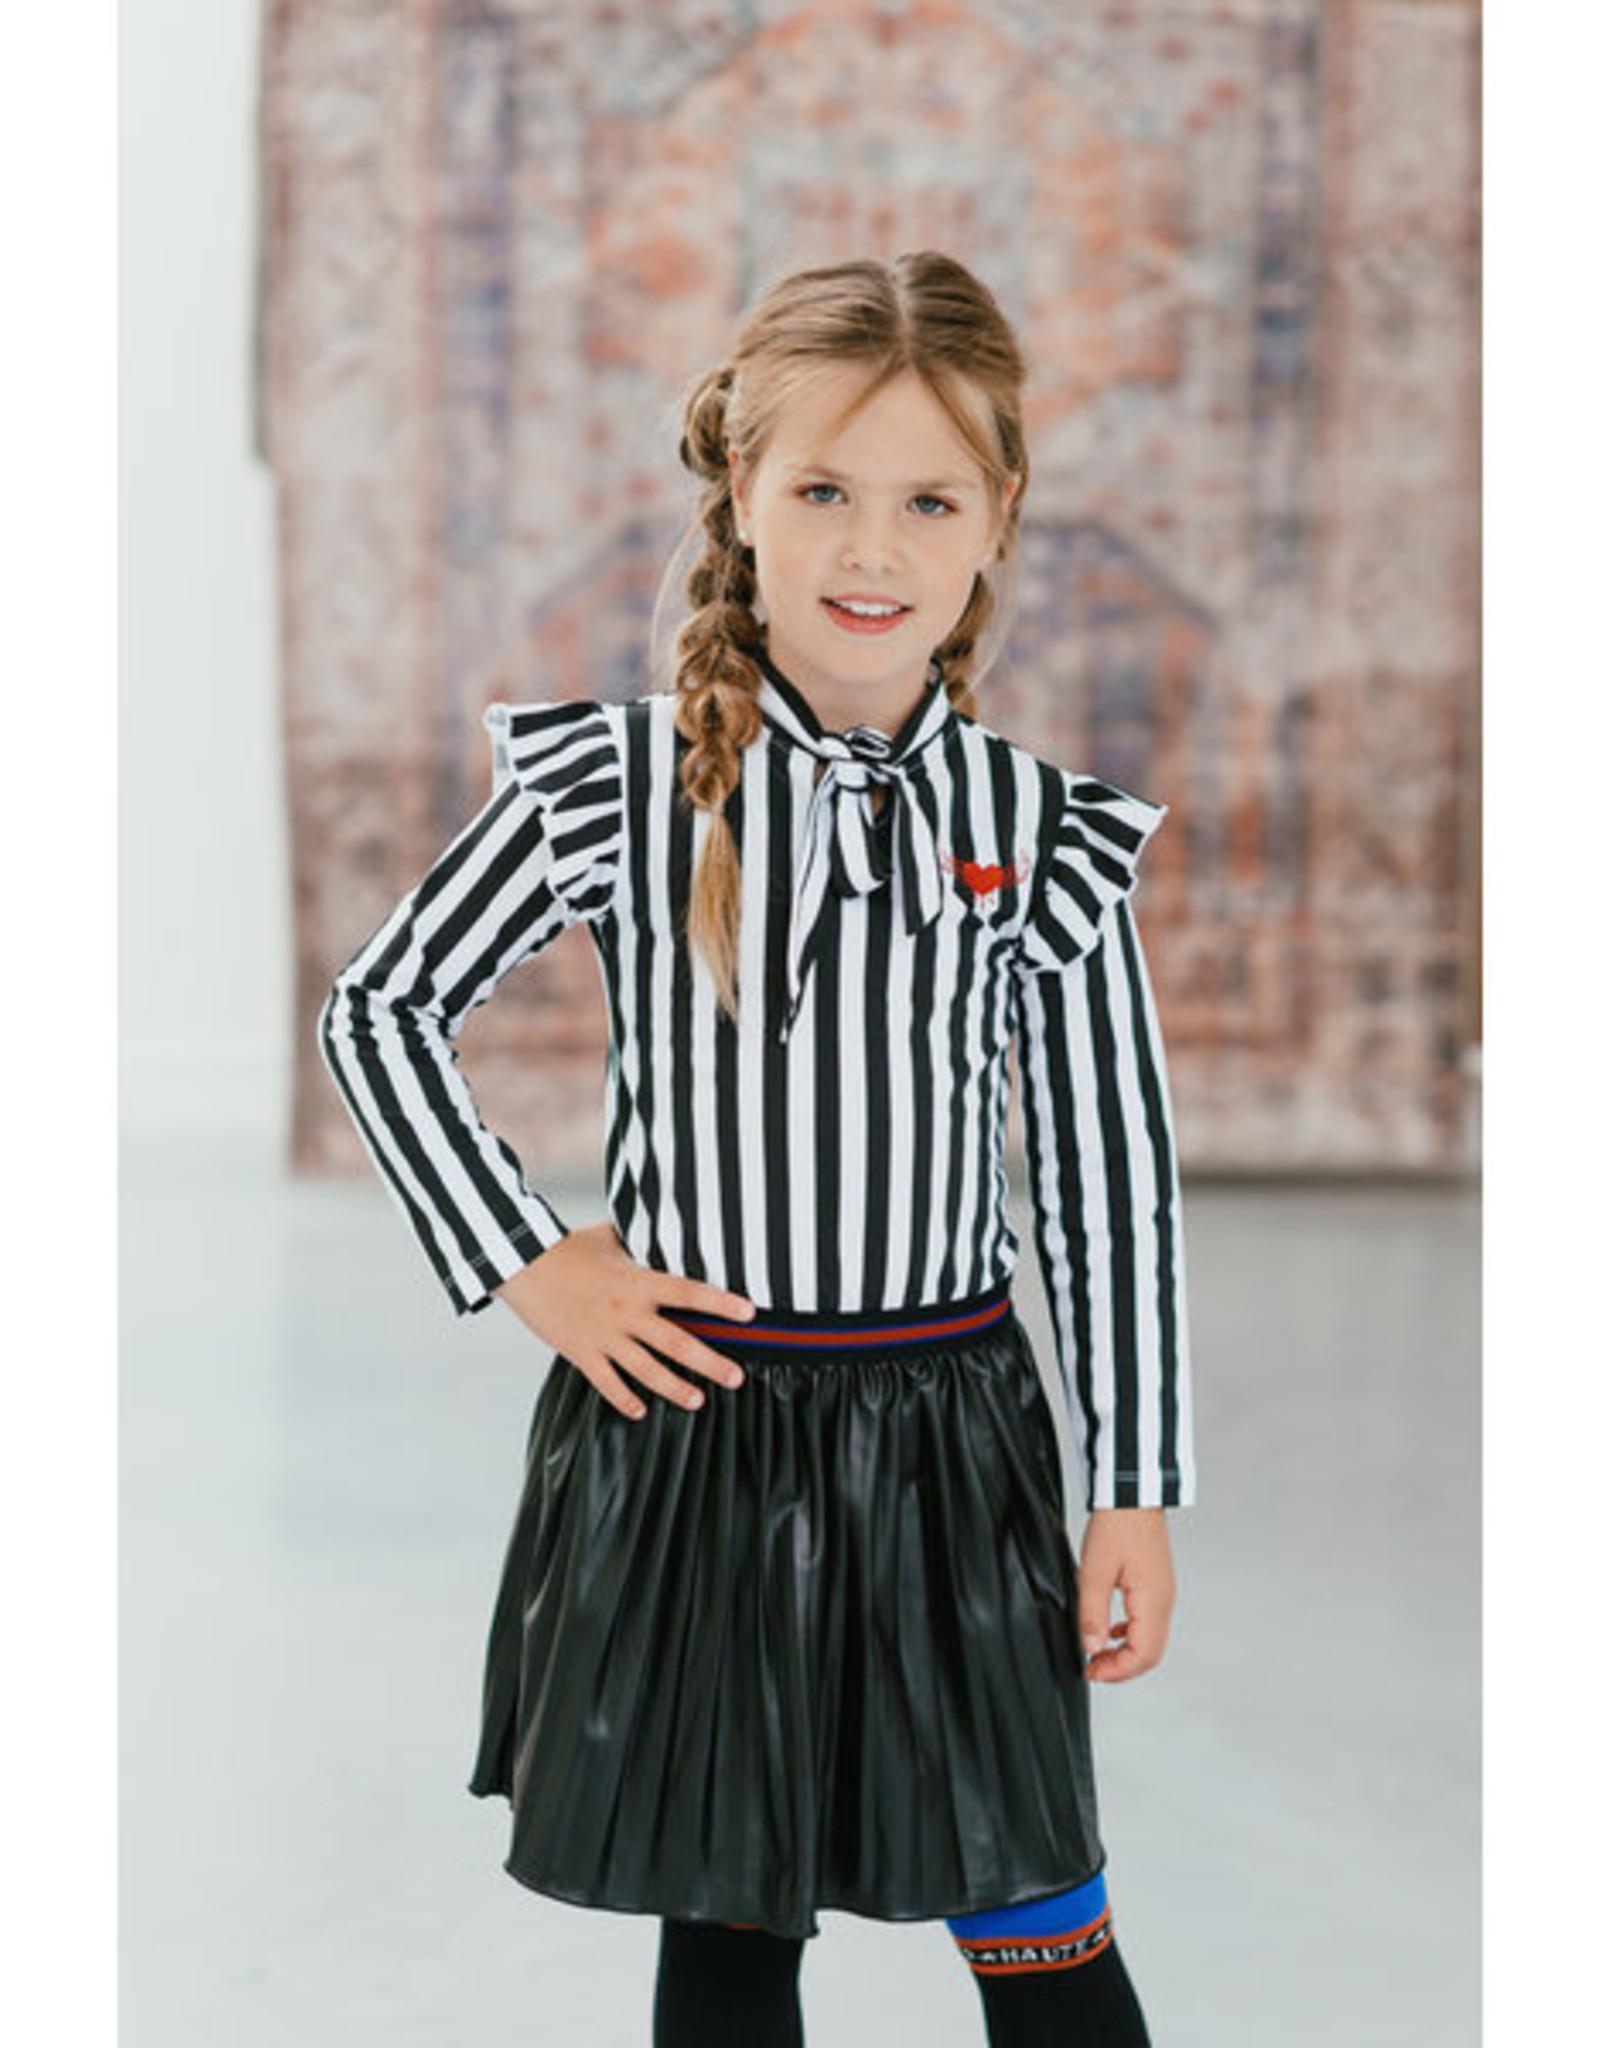 Topitm TOPitm dress Misty stripe/leather